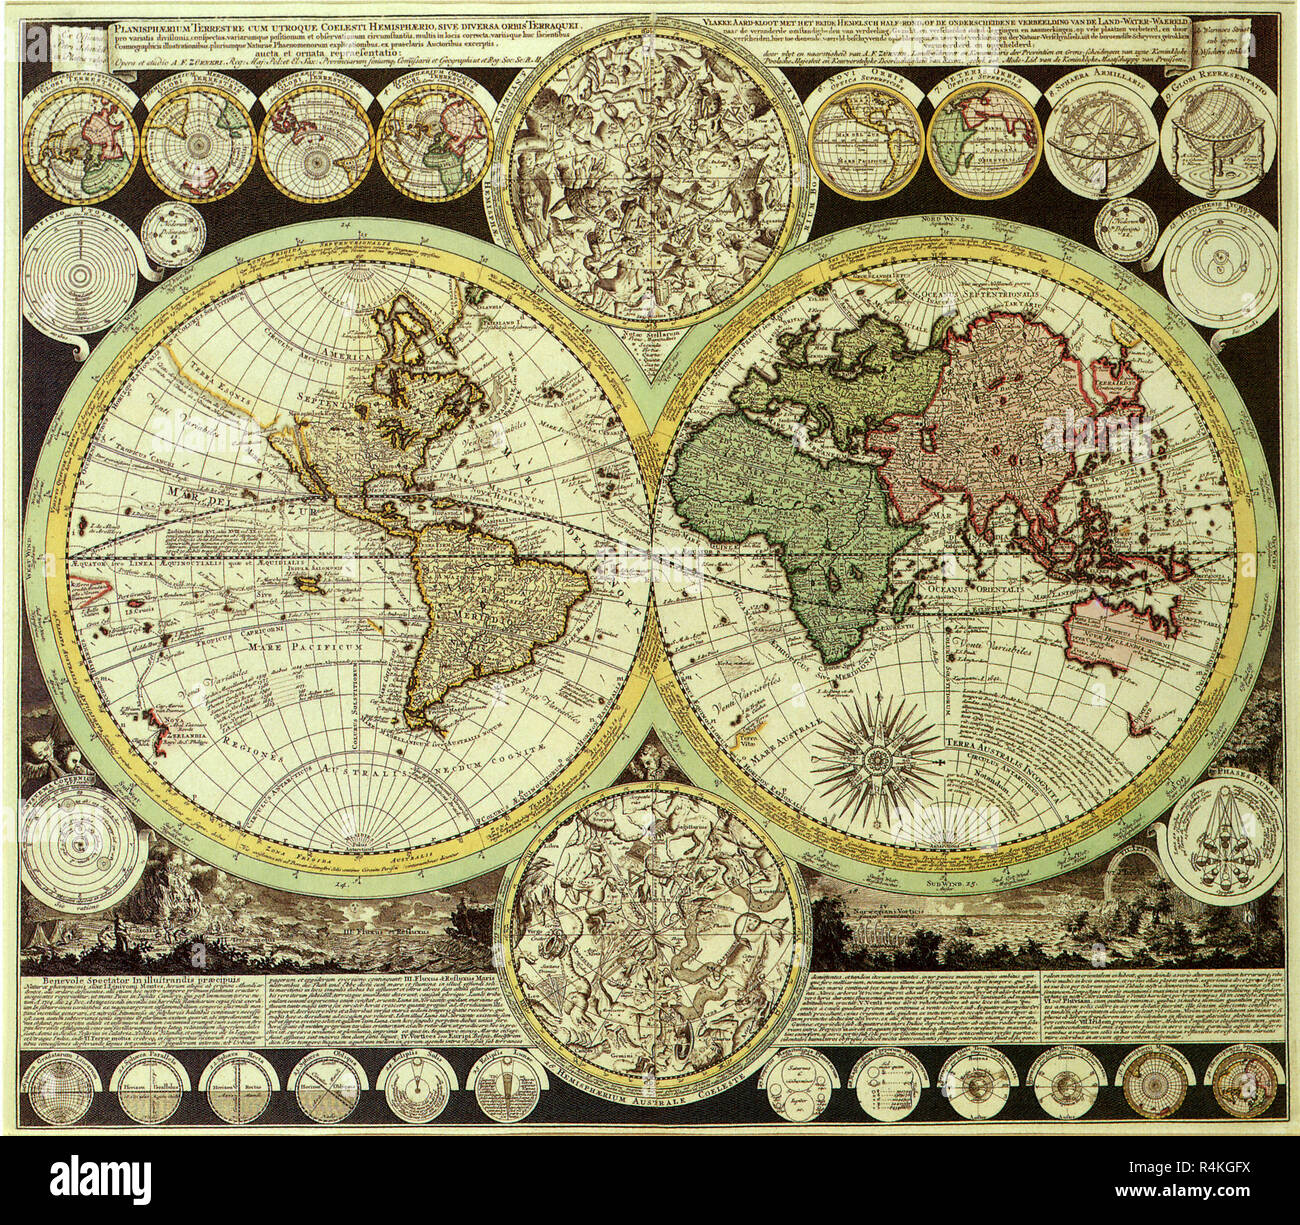 Map of the World 1700, Zumer, A.F Stock Photo: 226623486 - Alamy